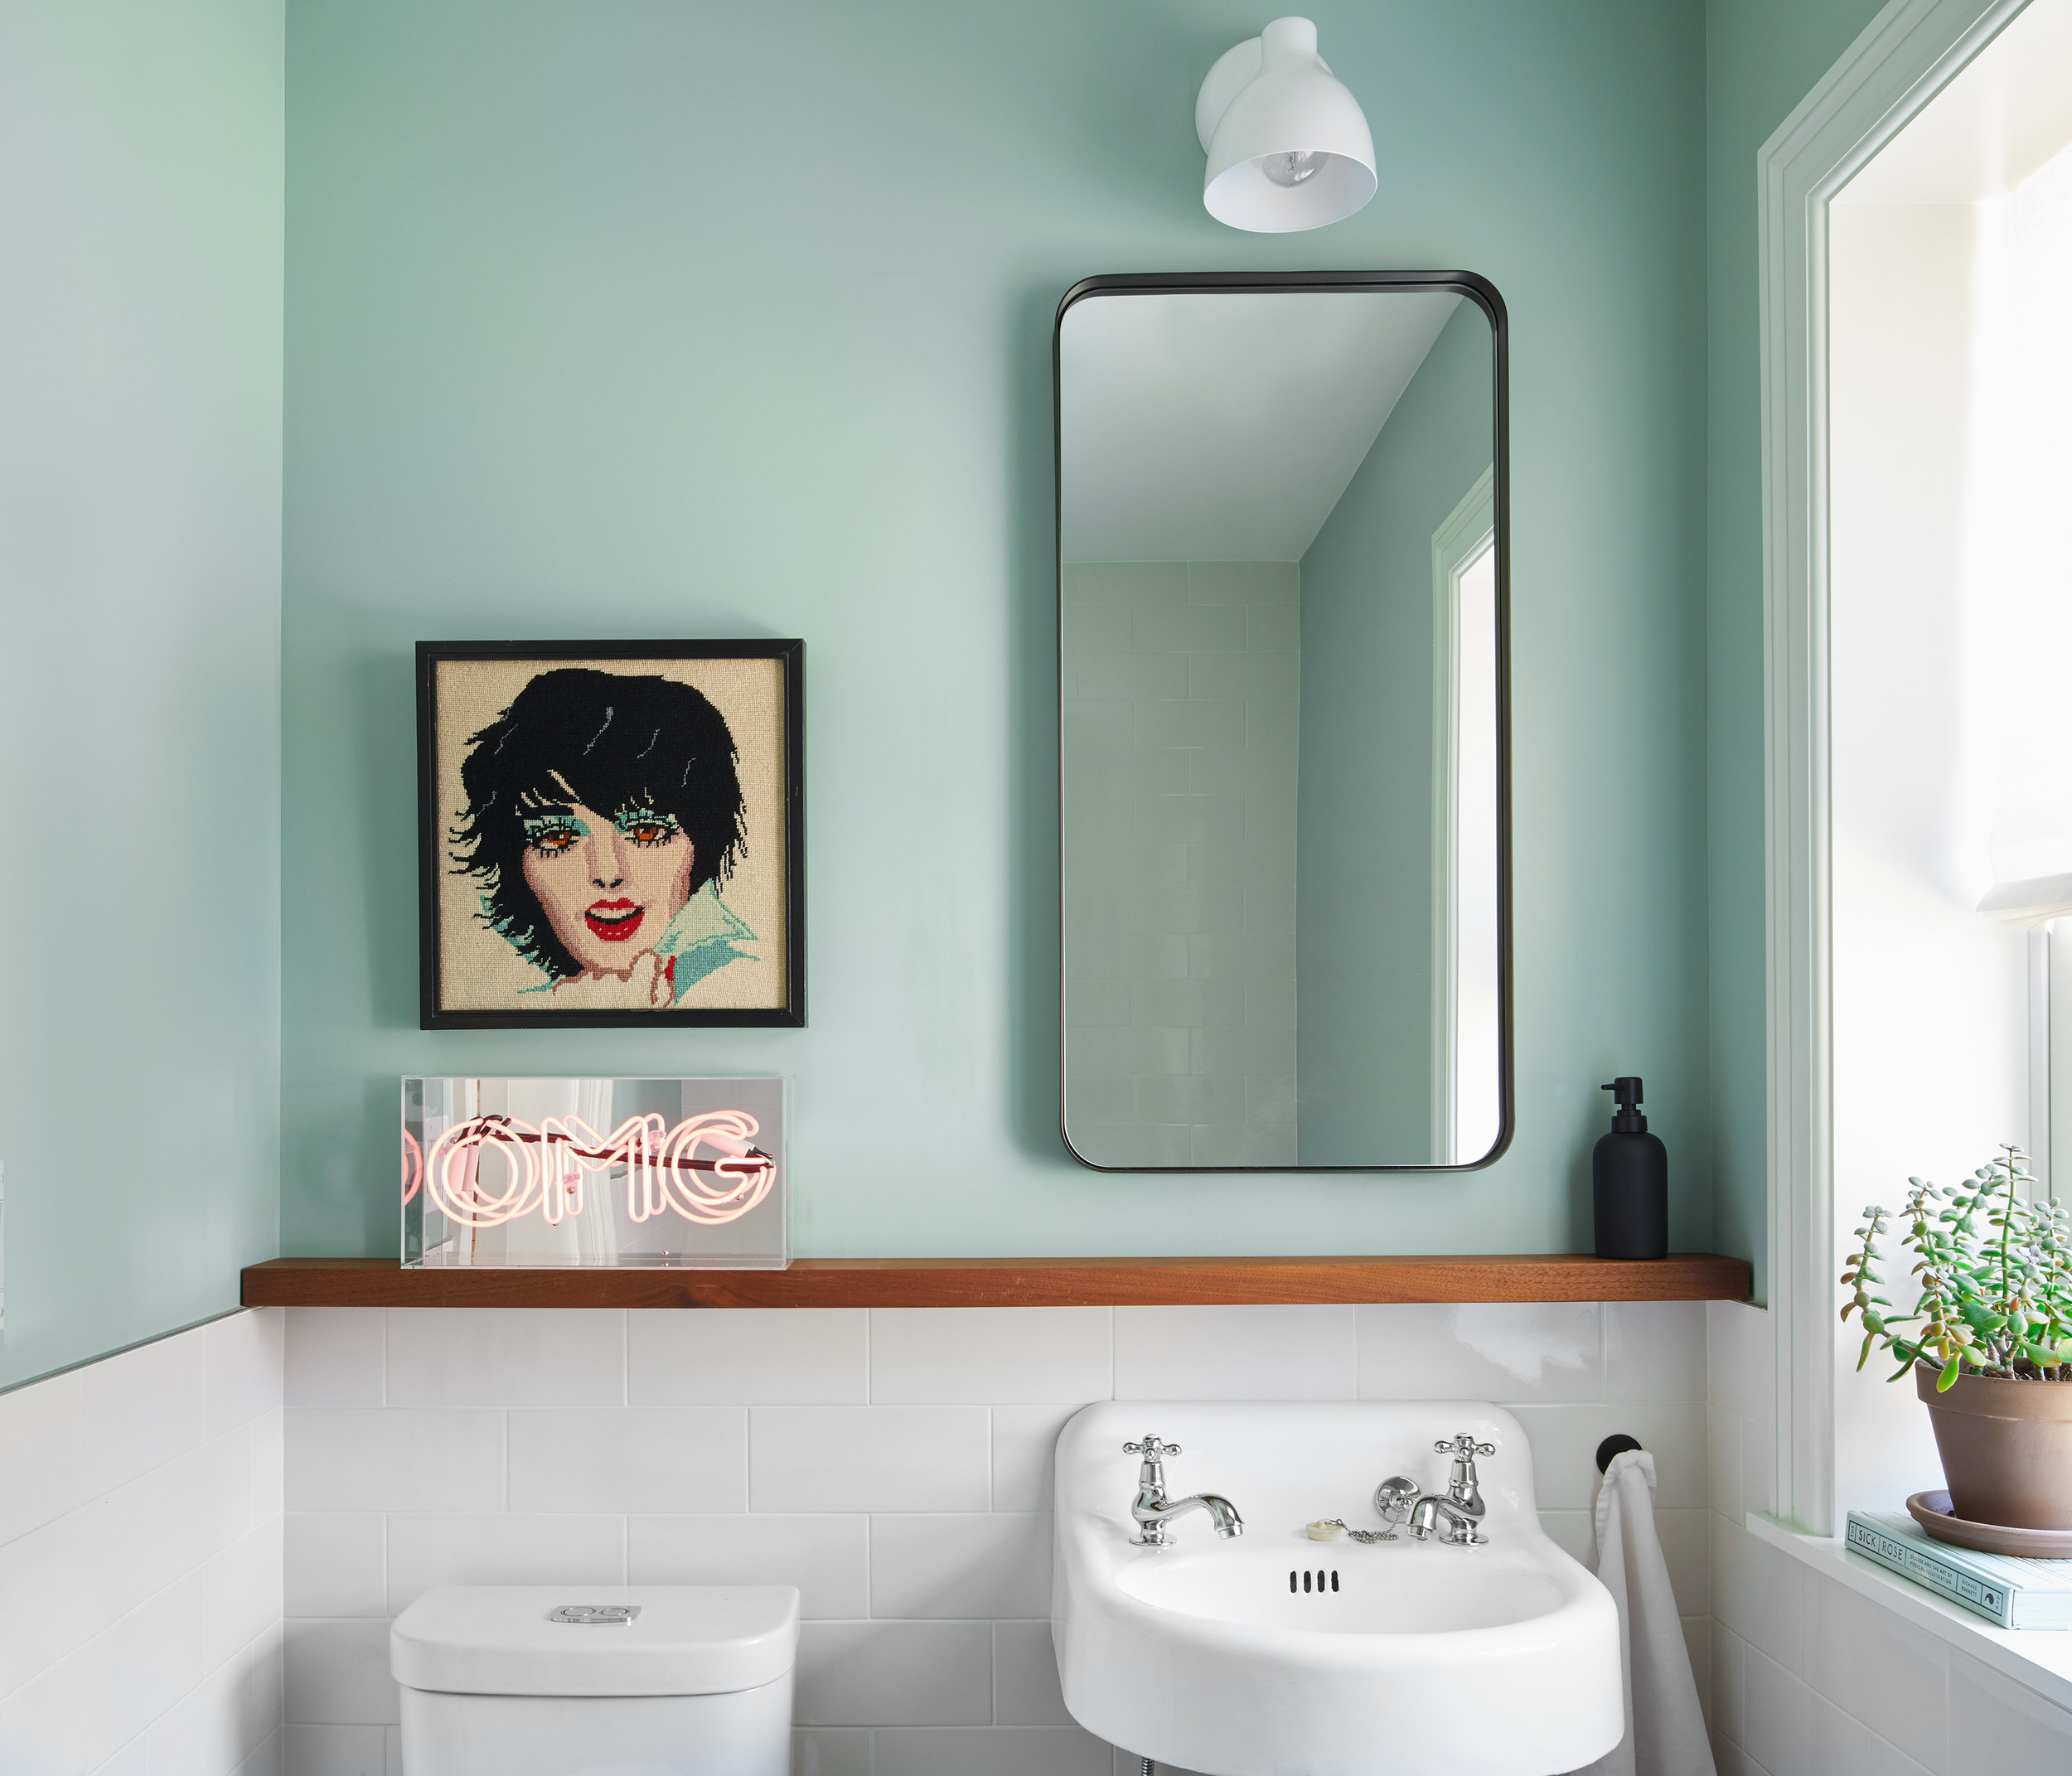 104-prospect-manor-bath-overall.jpg